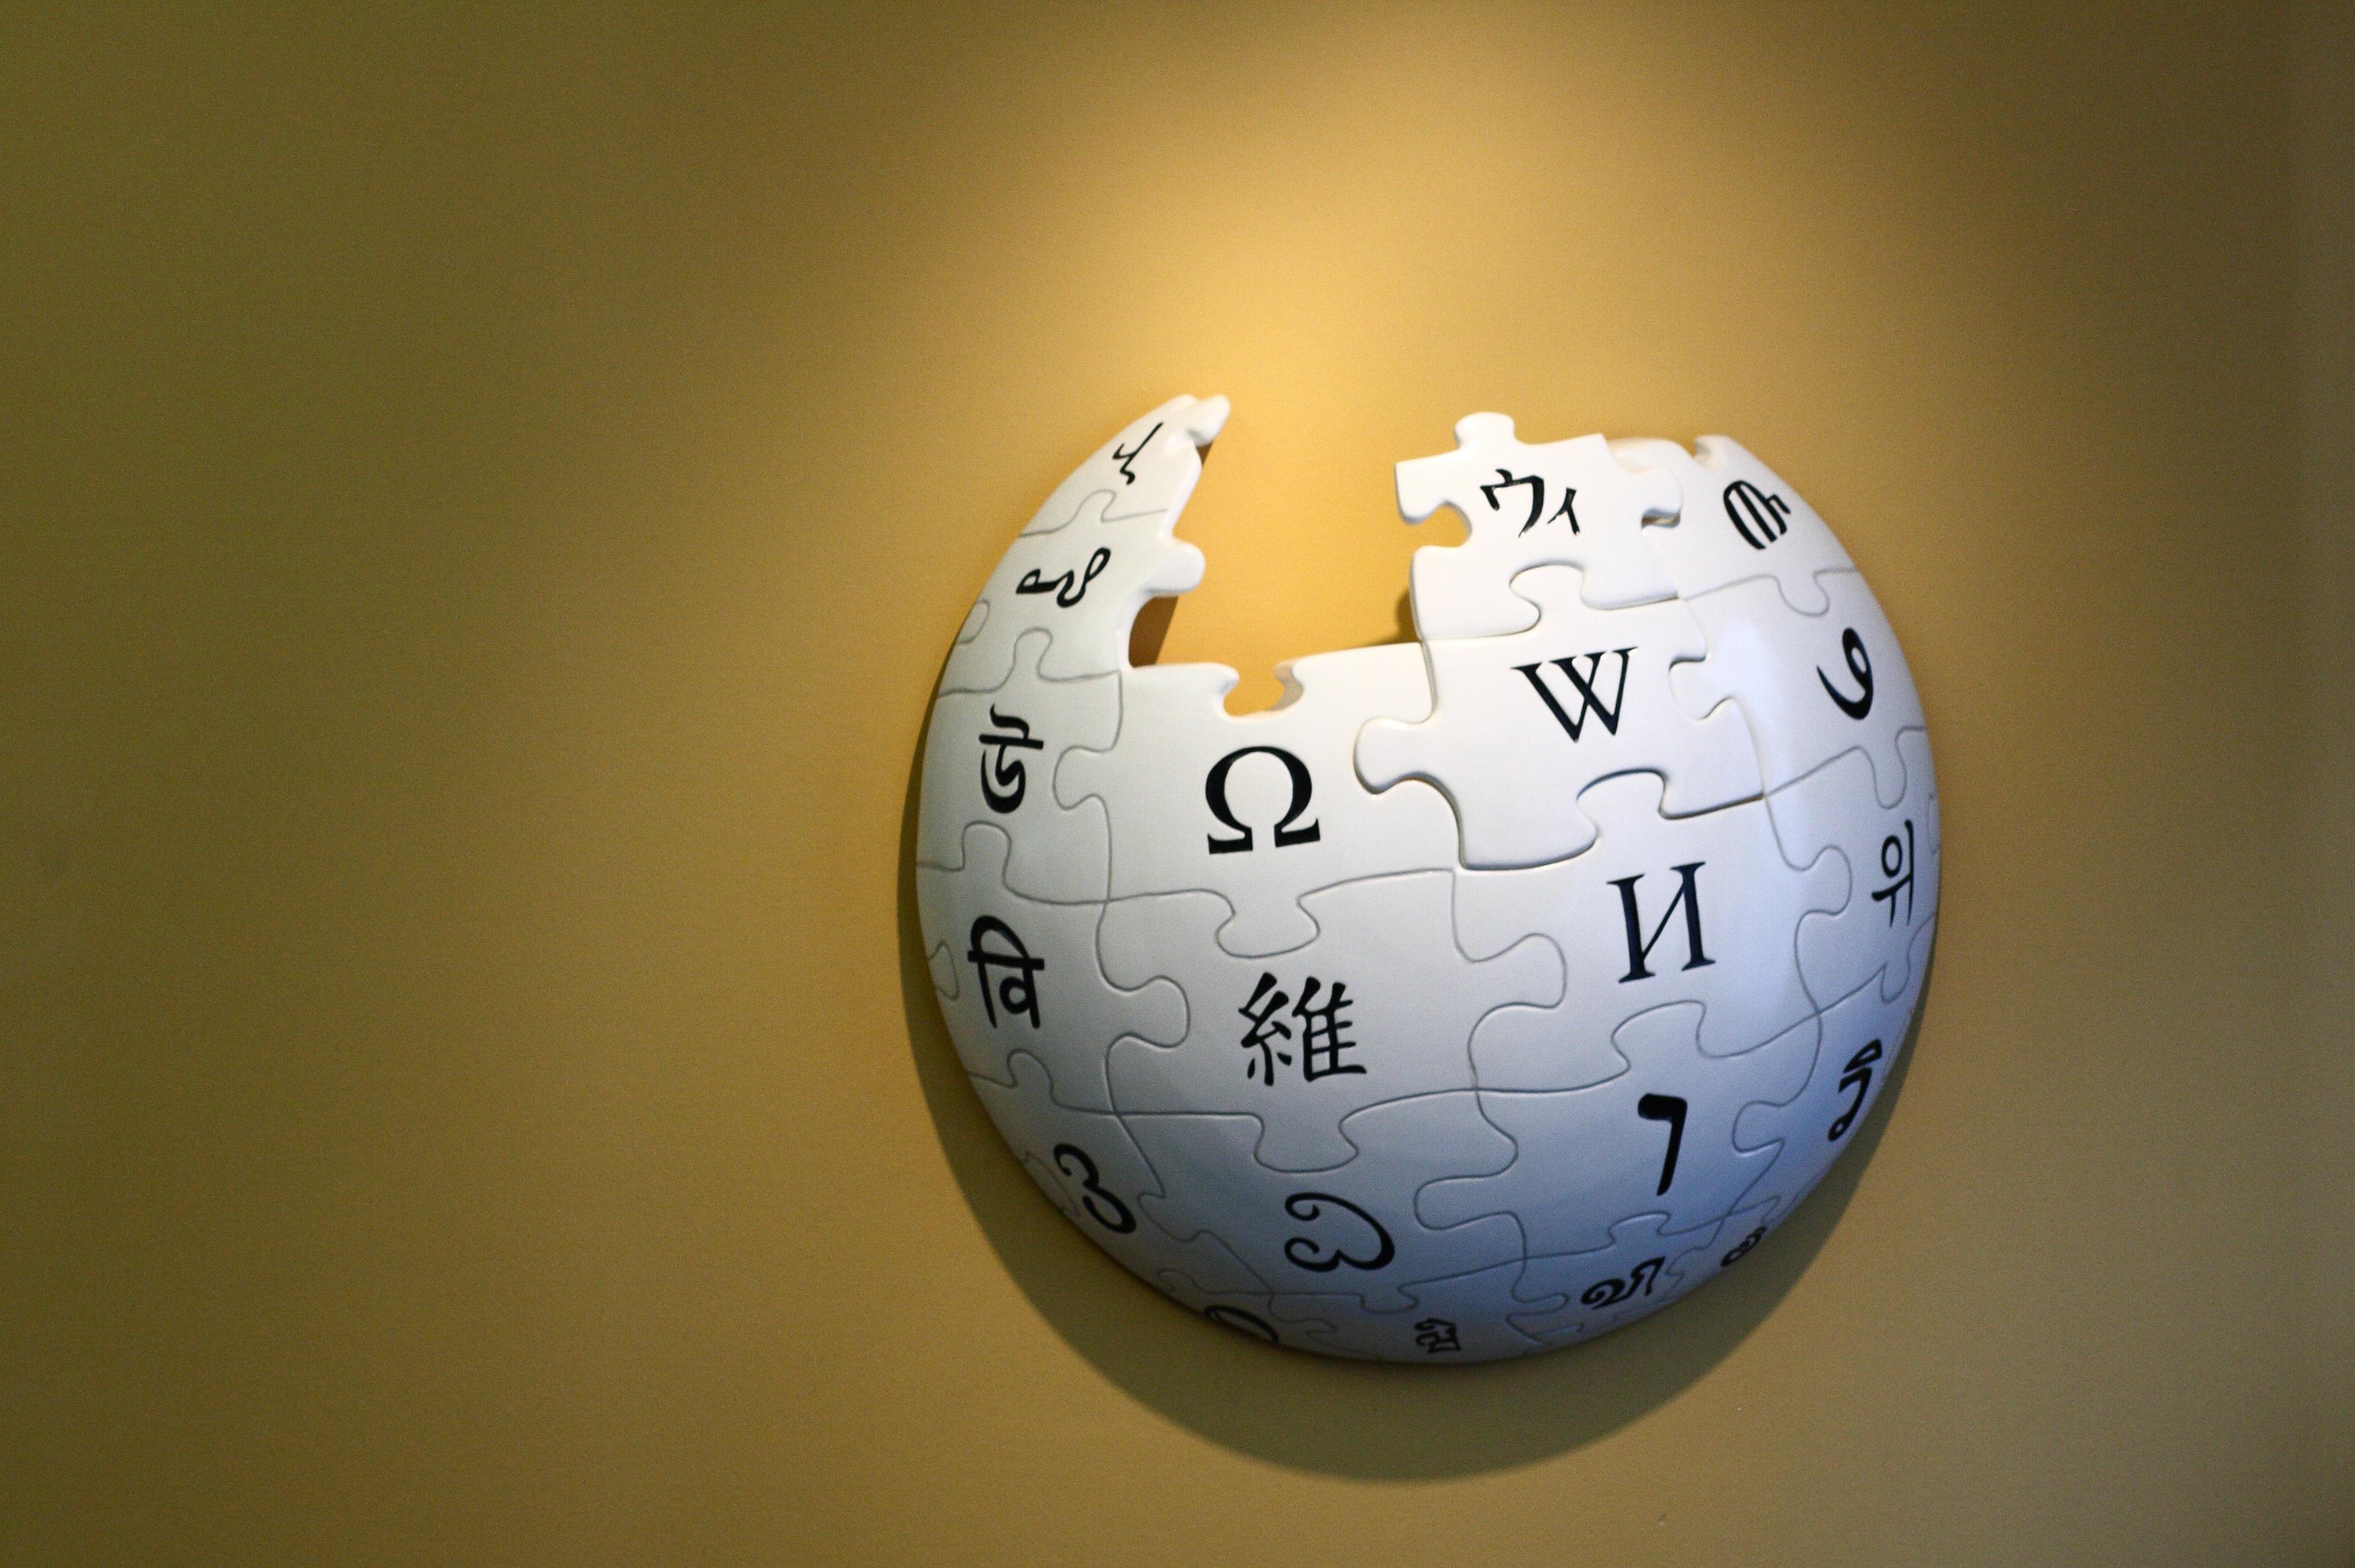 filewikipedia puzzle globe on the wall of the wikimedia